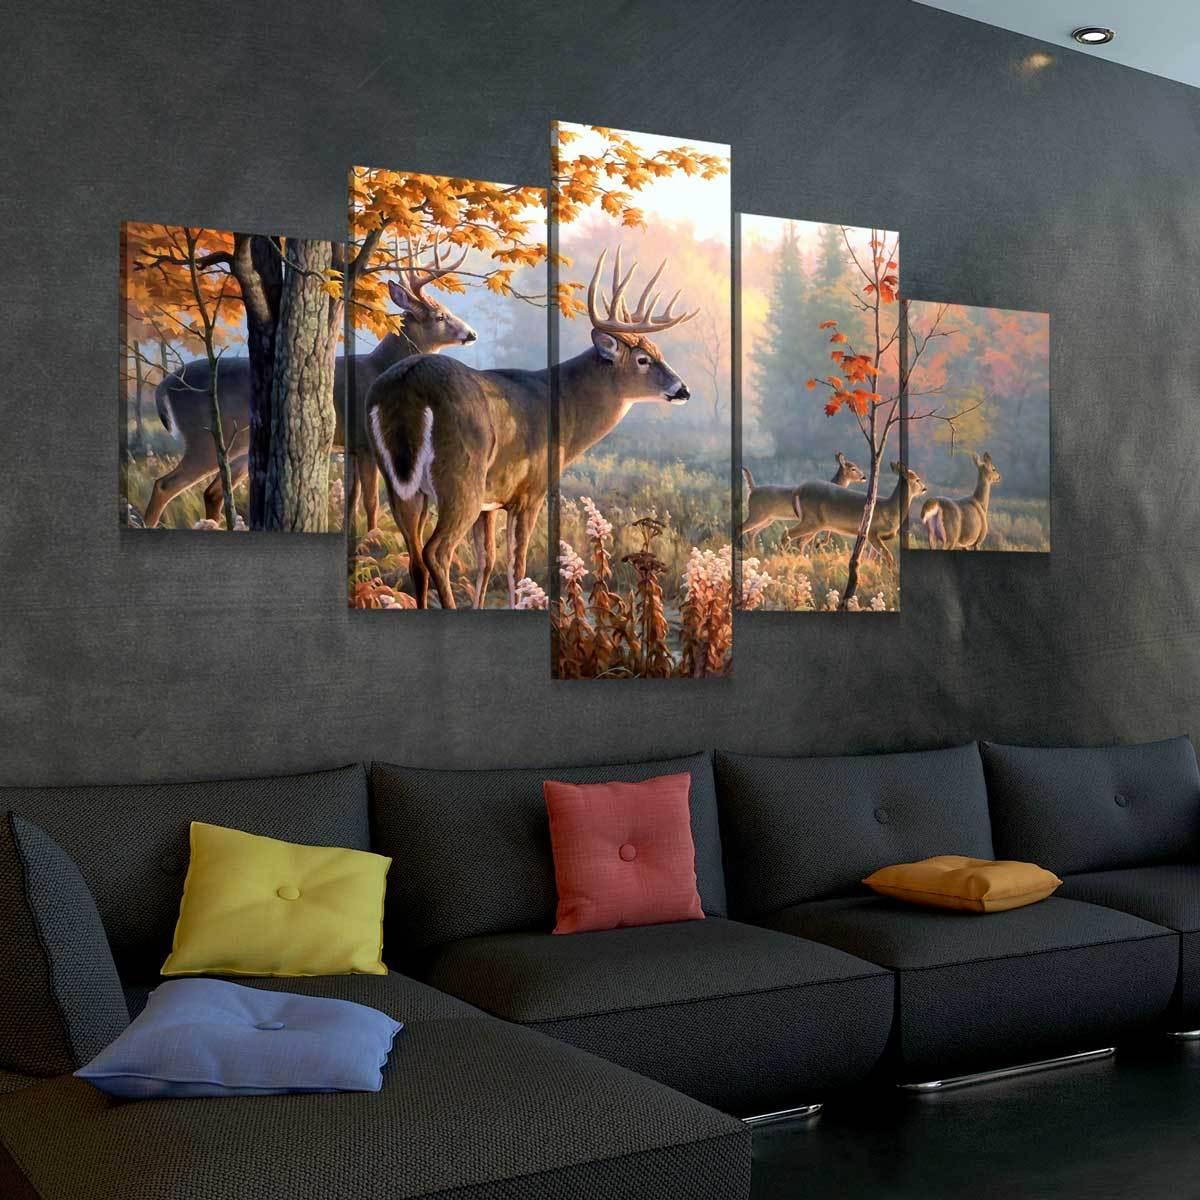 Whitetail Deer 5 panel canvas wall art